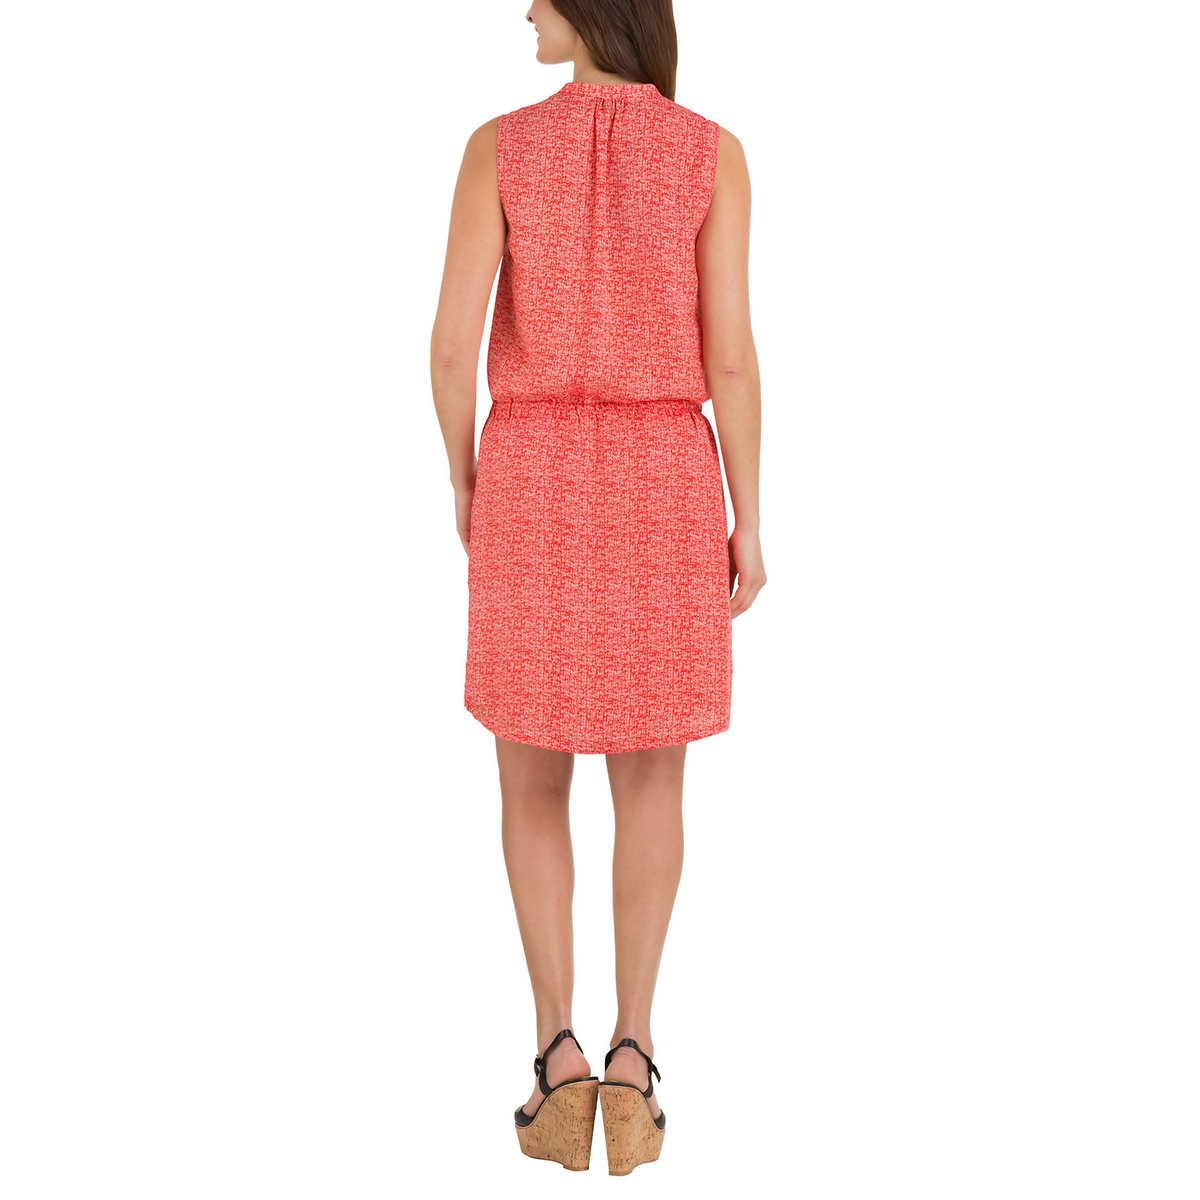 Hilary Radley Womens Sleeveless Dress